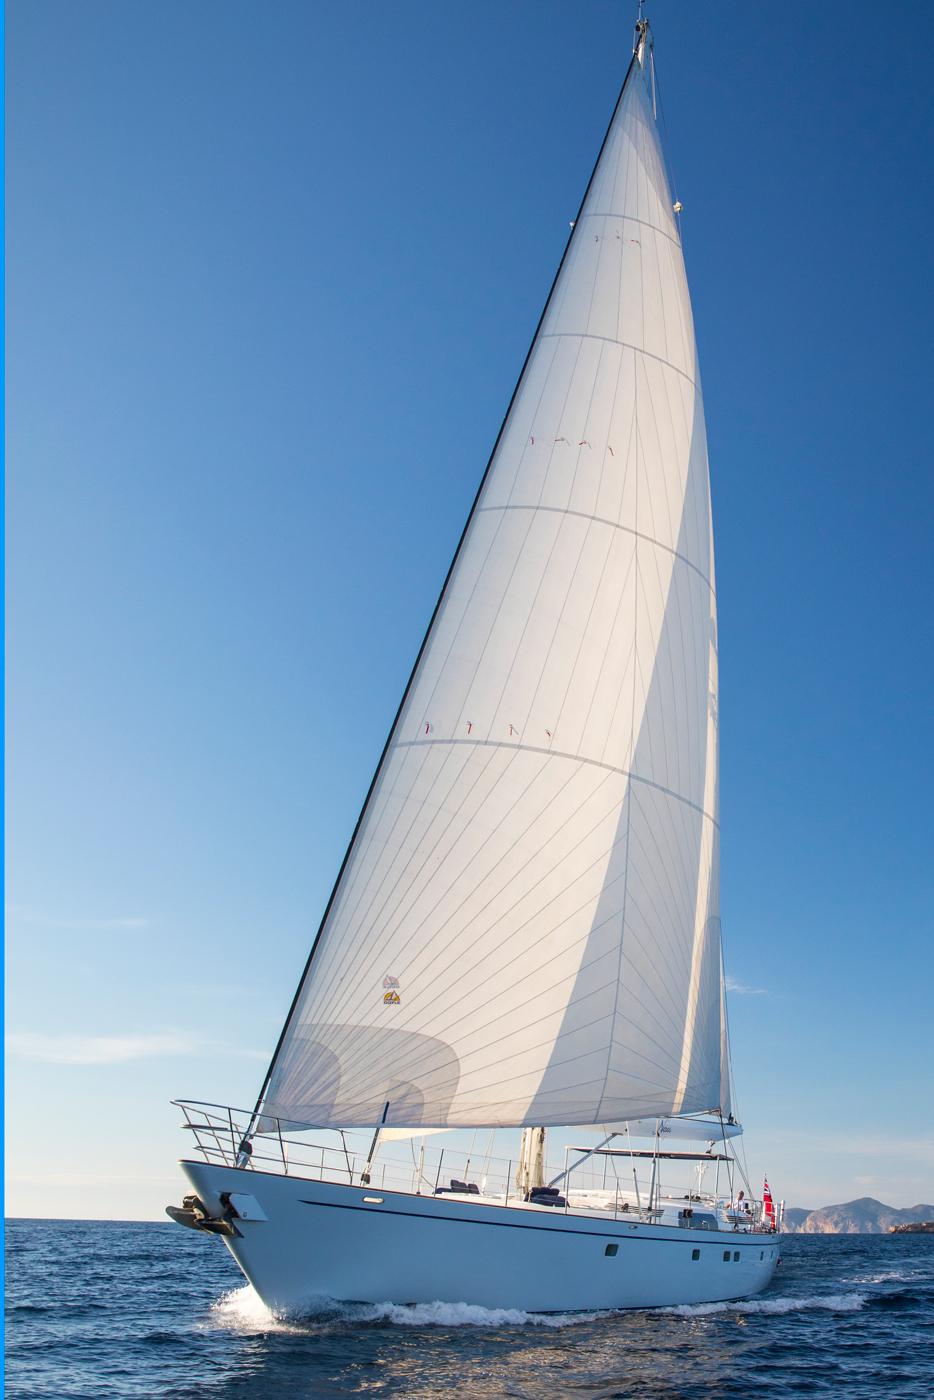 Sailing Yacht Naos